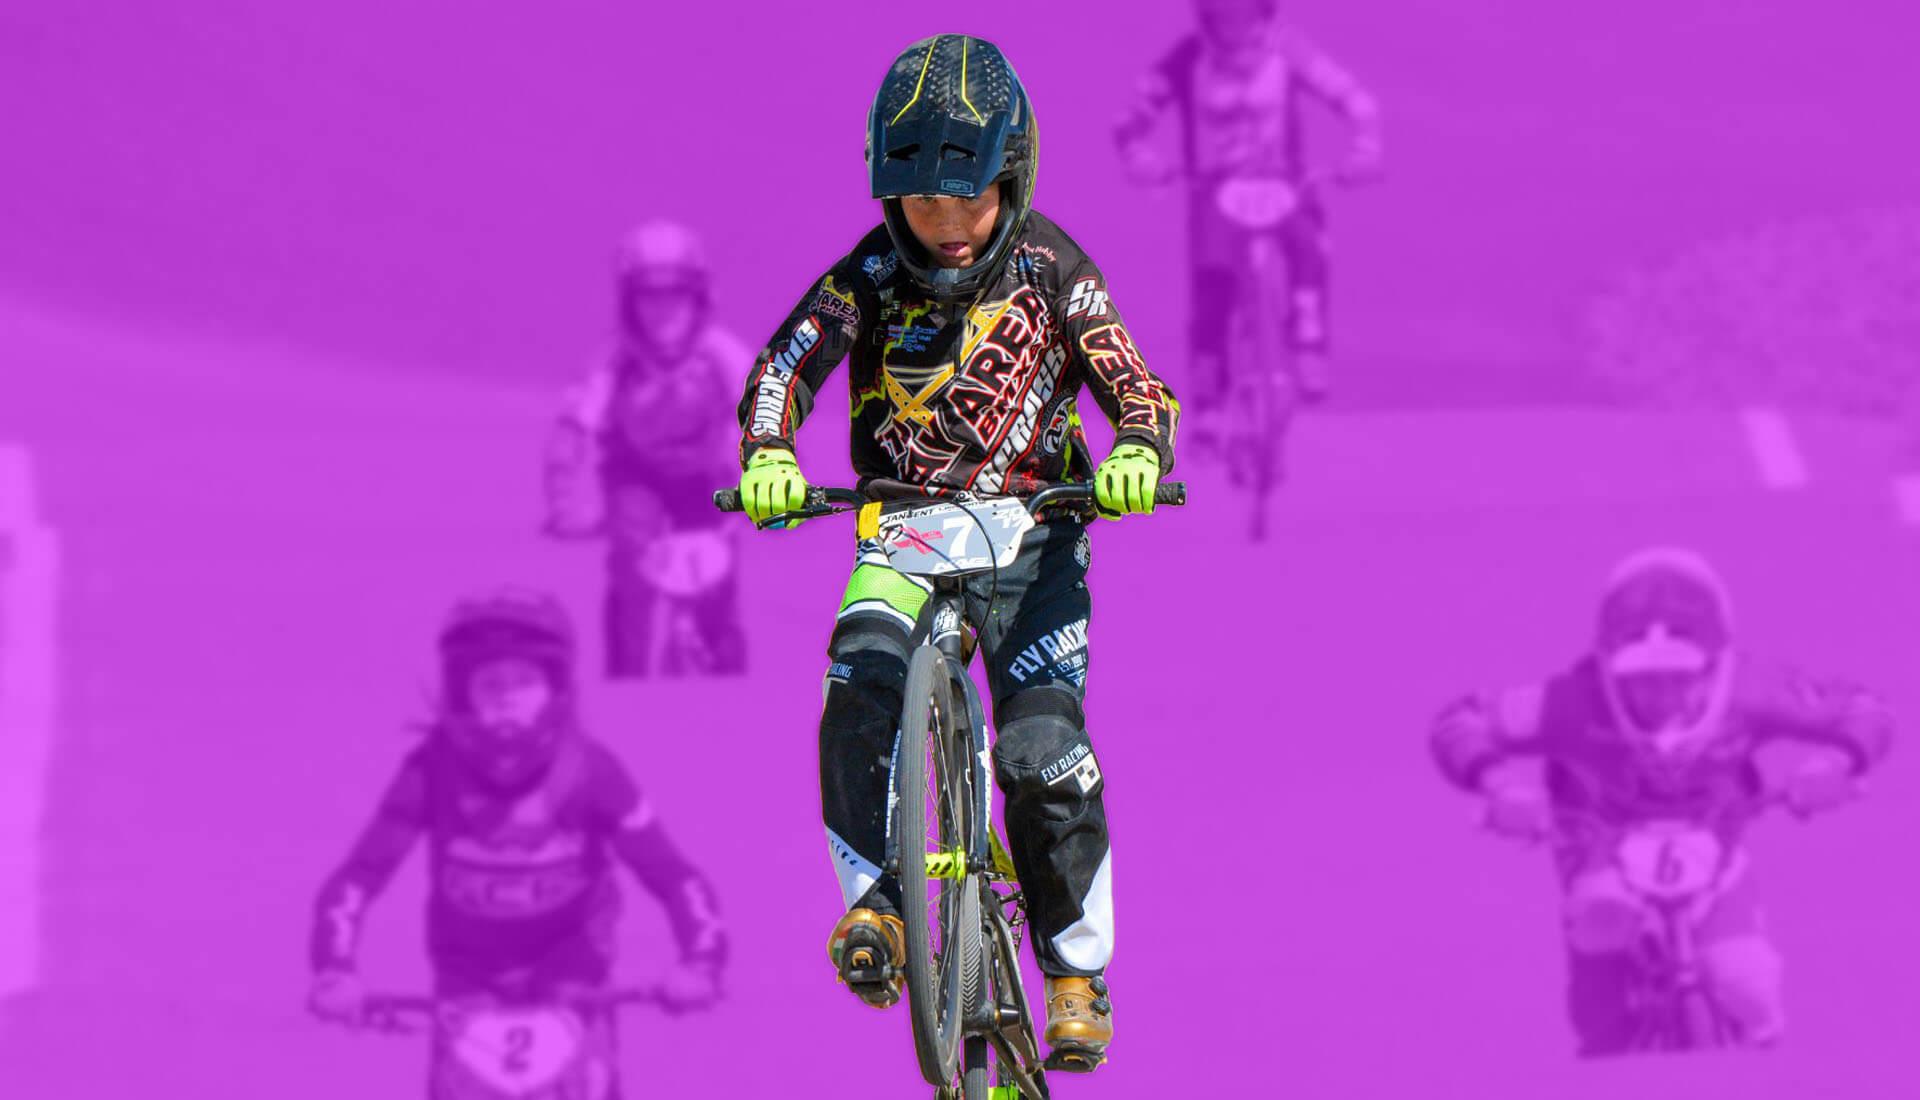 bay area bmxer banner purple